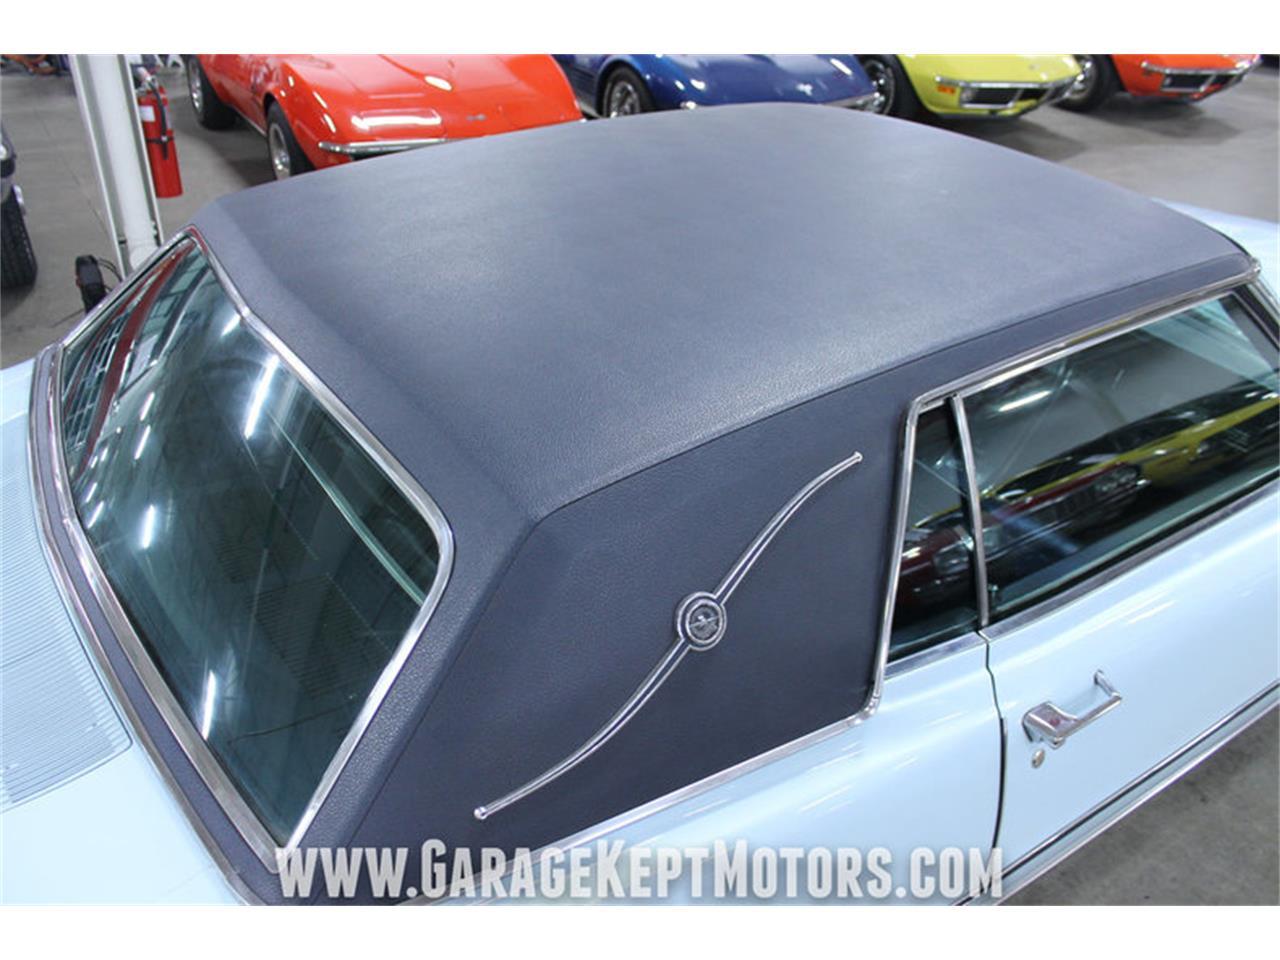 Large Picture of 1967 Ford Thunderbird 2-Door Landau Offered by Garage Kept Motors - LU7P